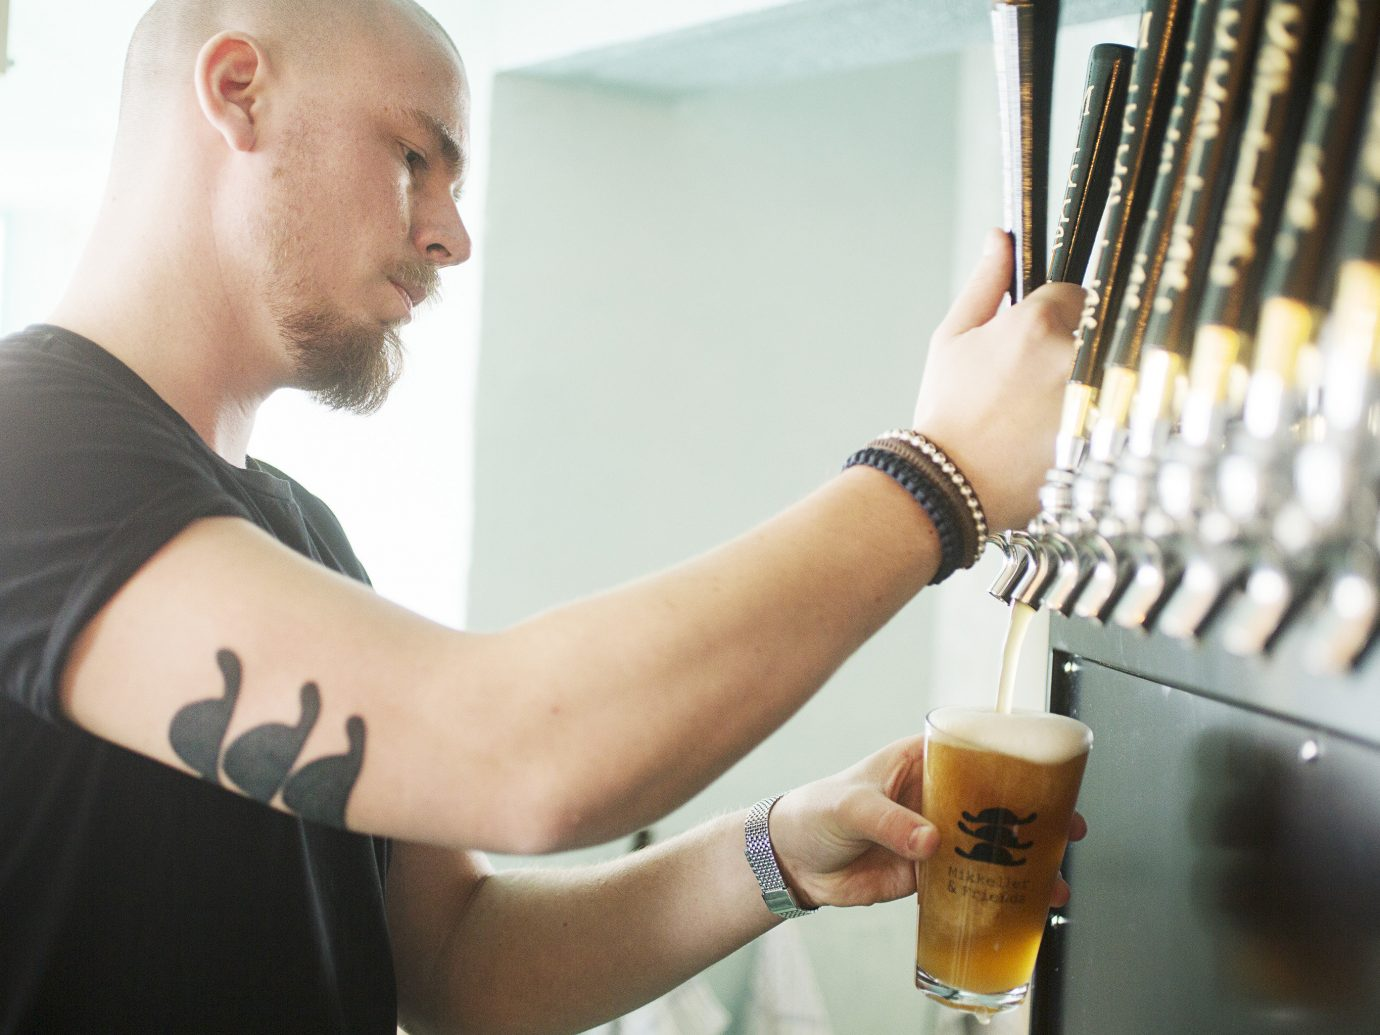 Copenhagen Denmark Trip Ideas person indoor Drink shoulder arm alcoholic beverage muscle distilled beverage liqueur beer neck alcohol